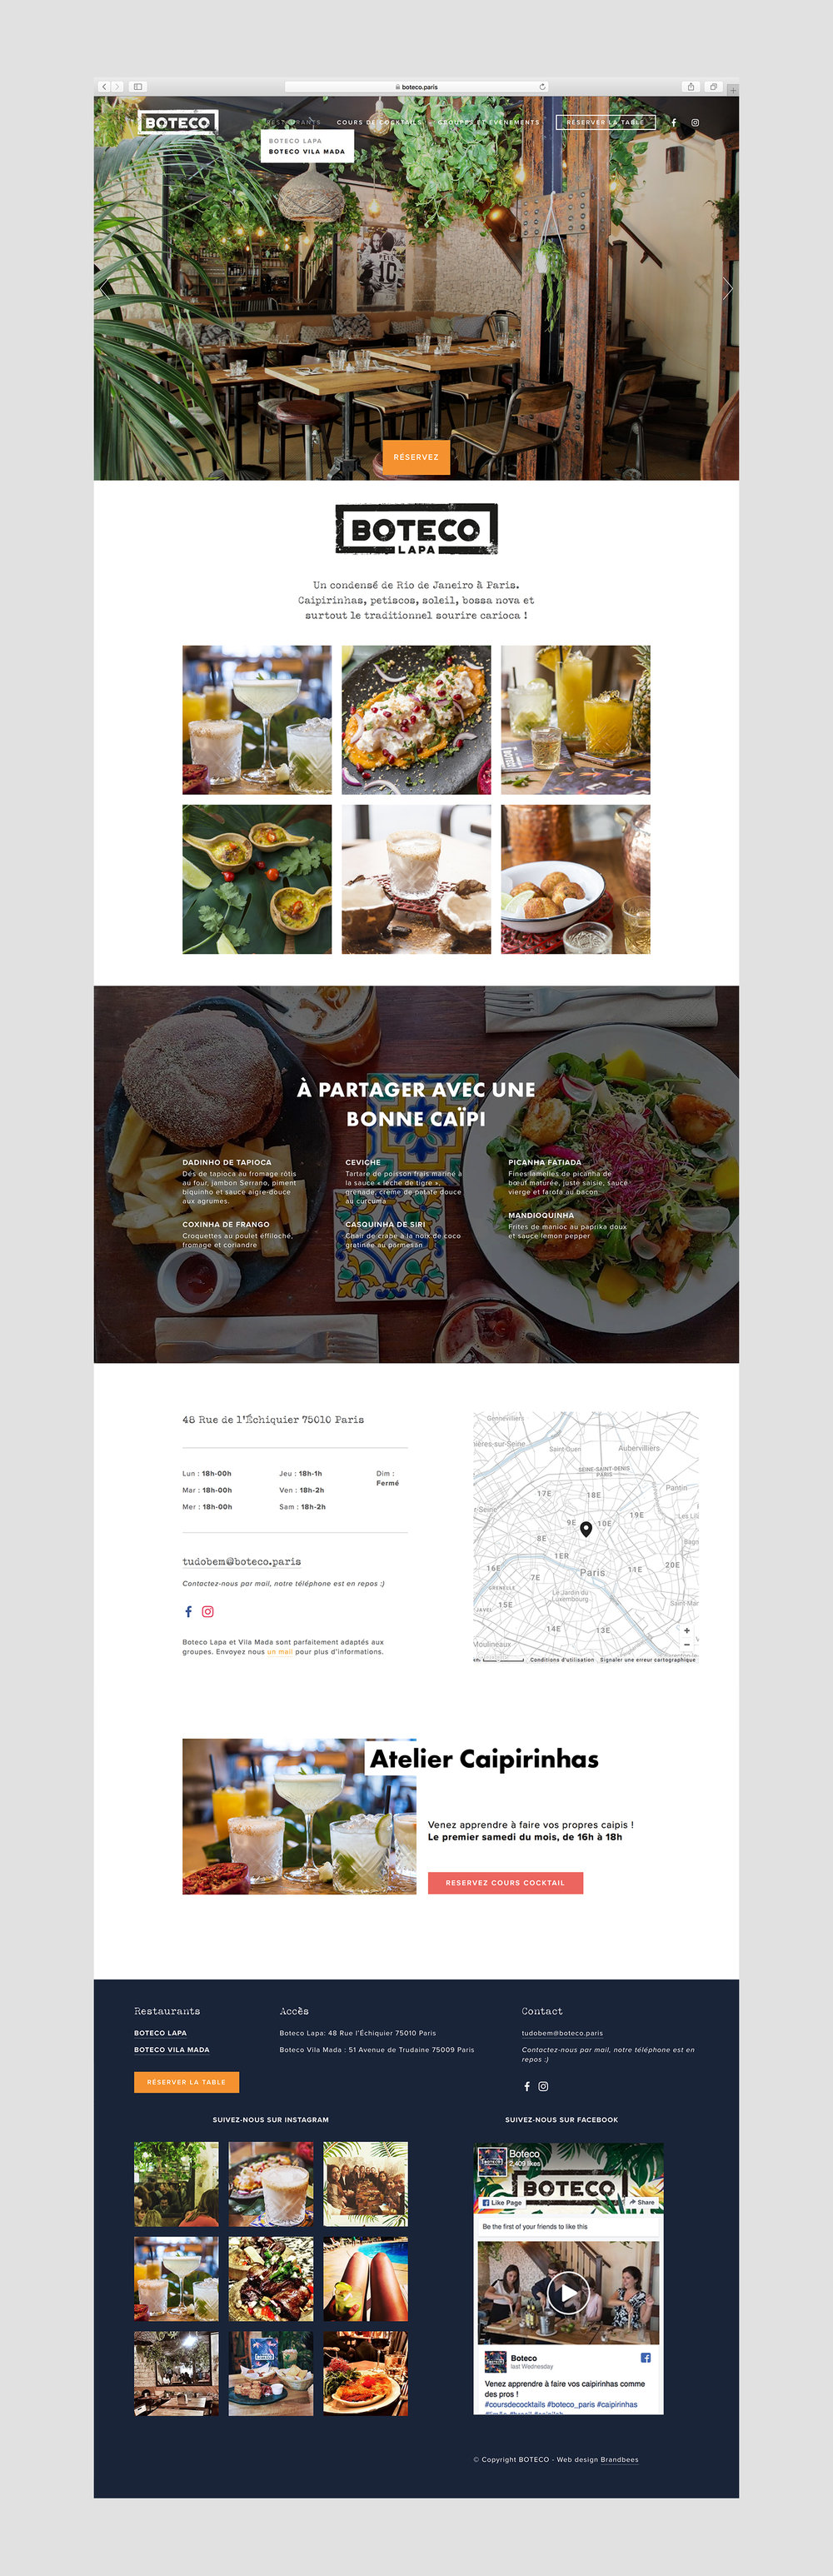 Boteco-website-design-by-Brandbees_2.jpg